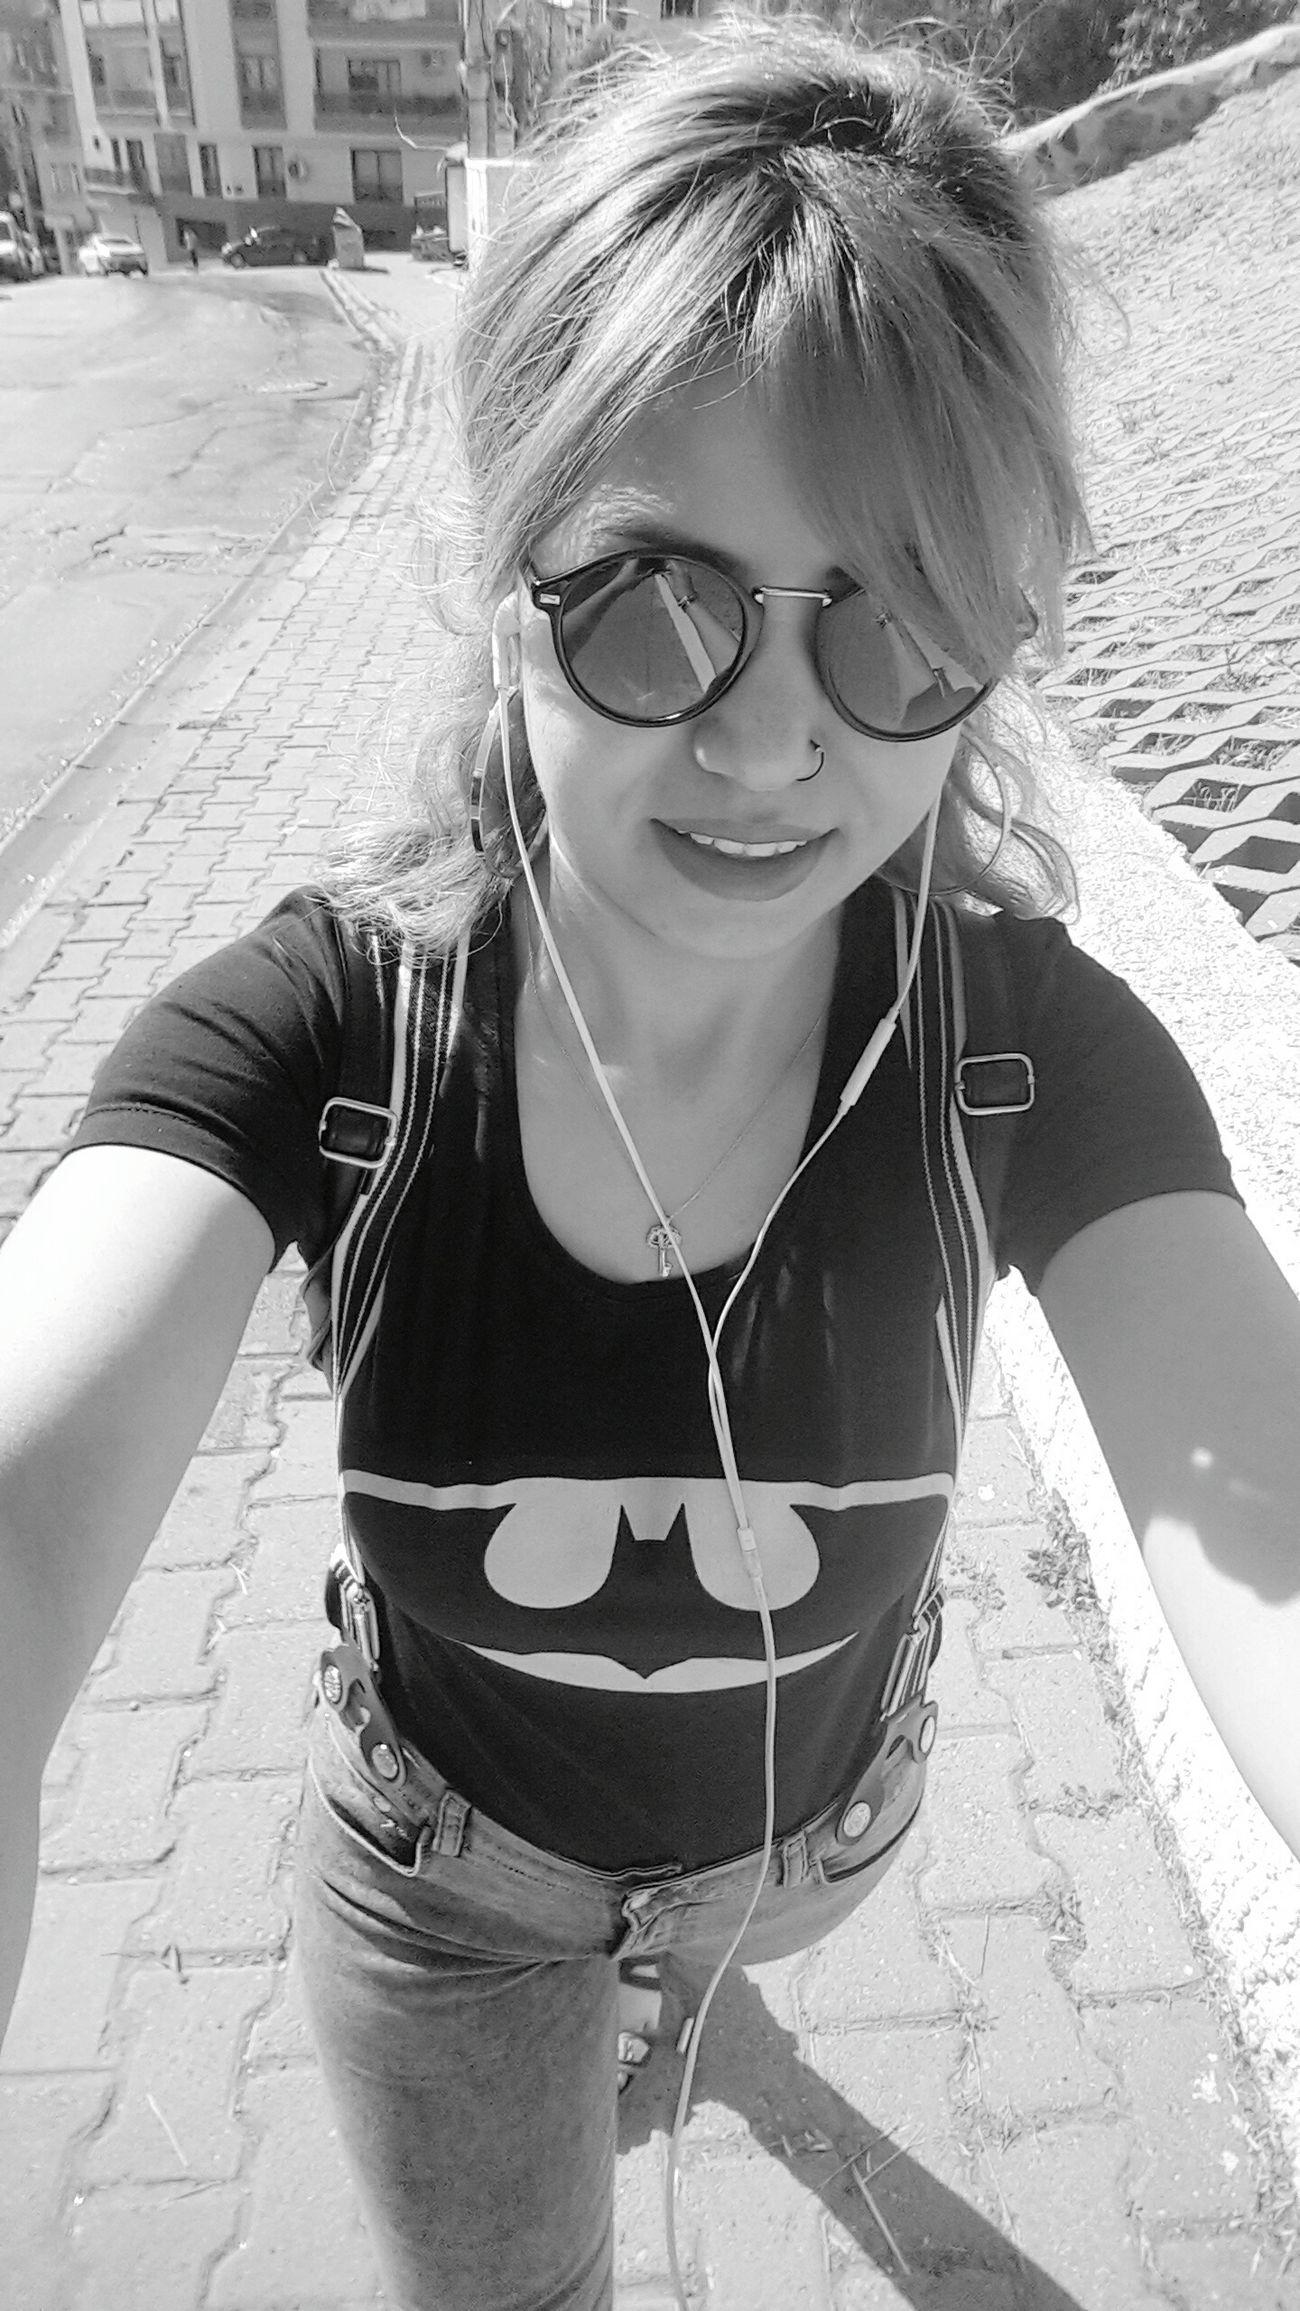 Helloo 😉👍✌ Batman Hello World Glass Beauty Street Photography Amazing Cool Morning Enjoying Life Likebackteam